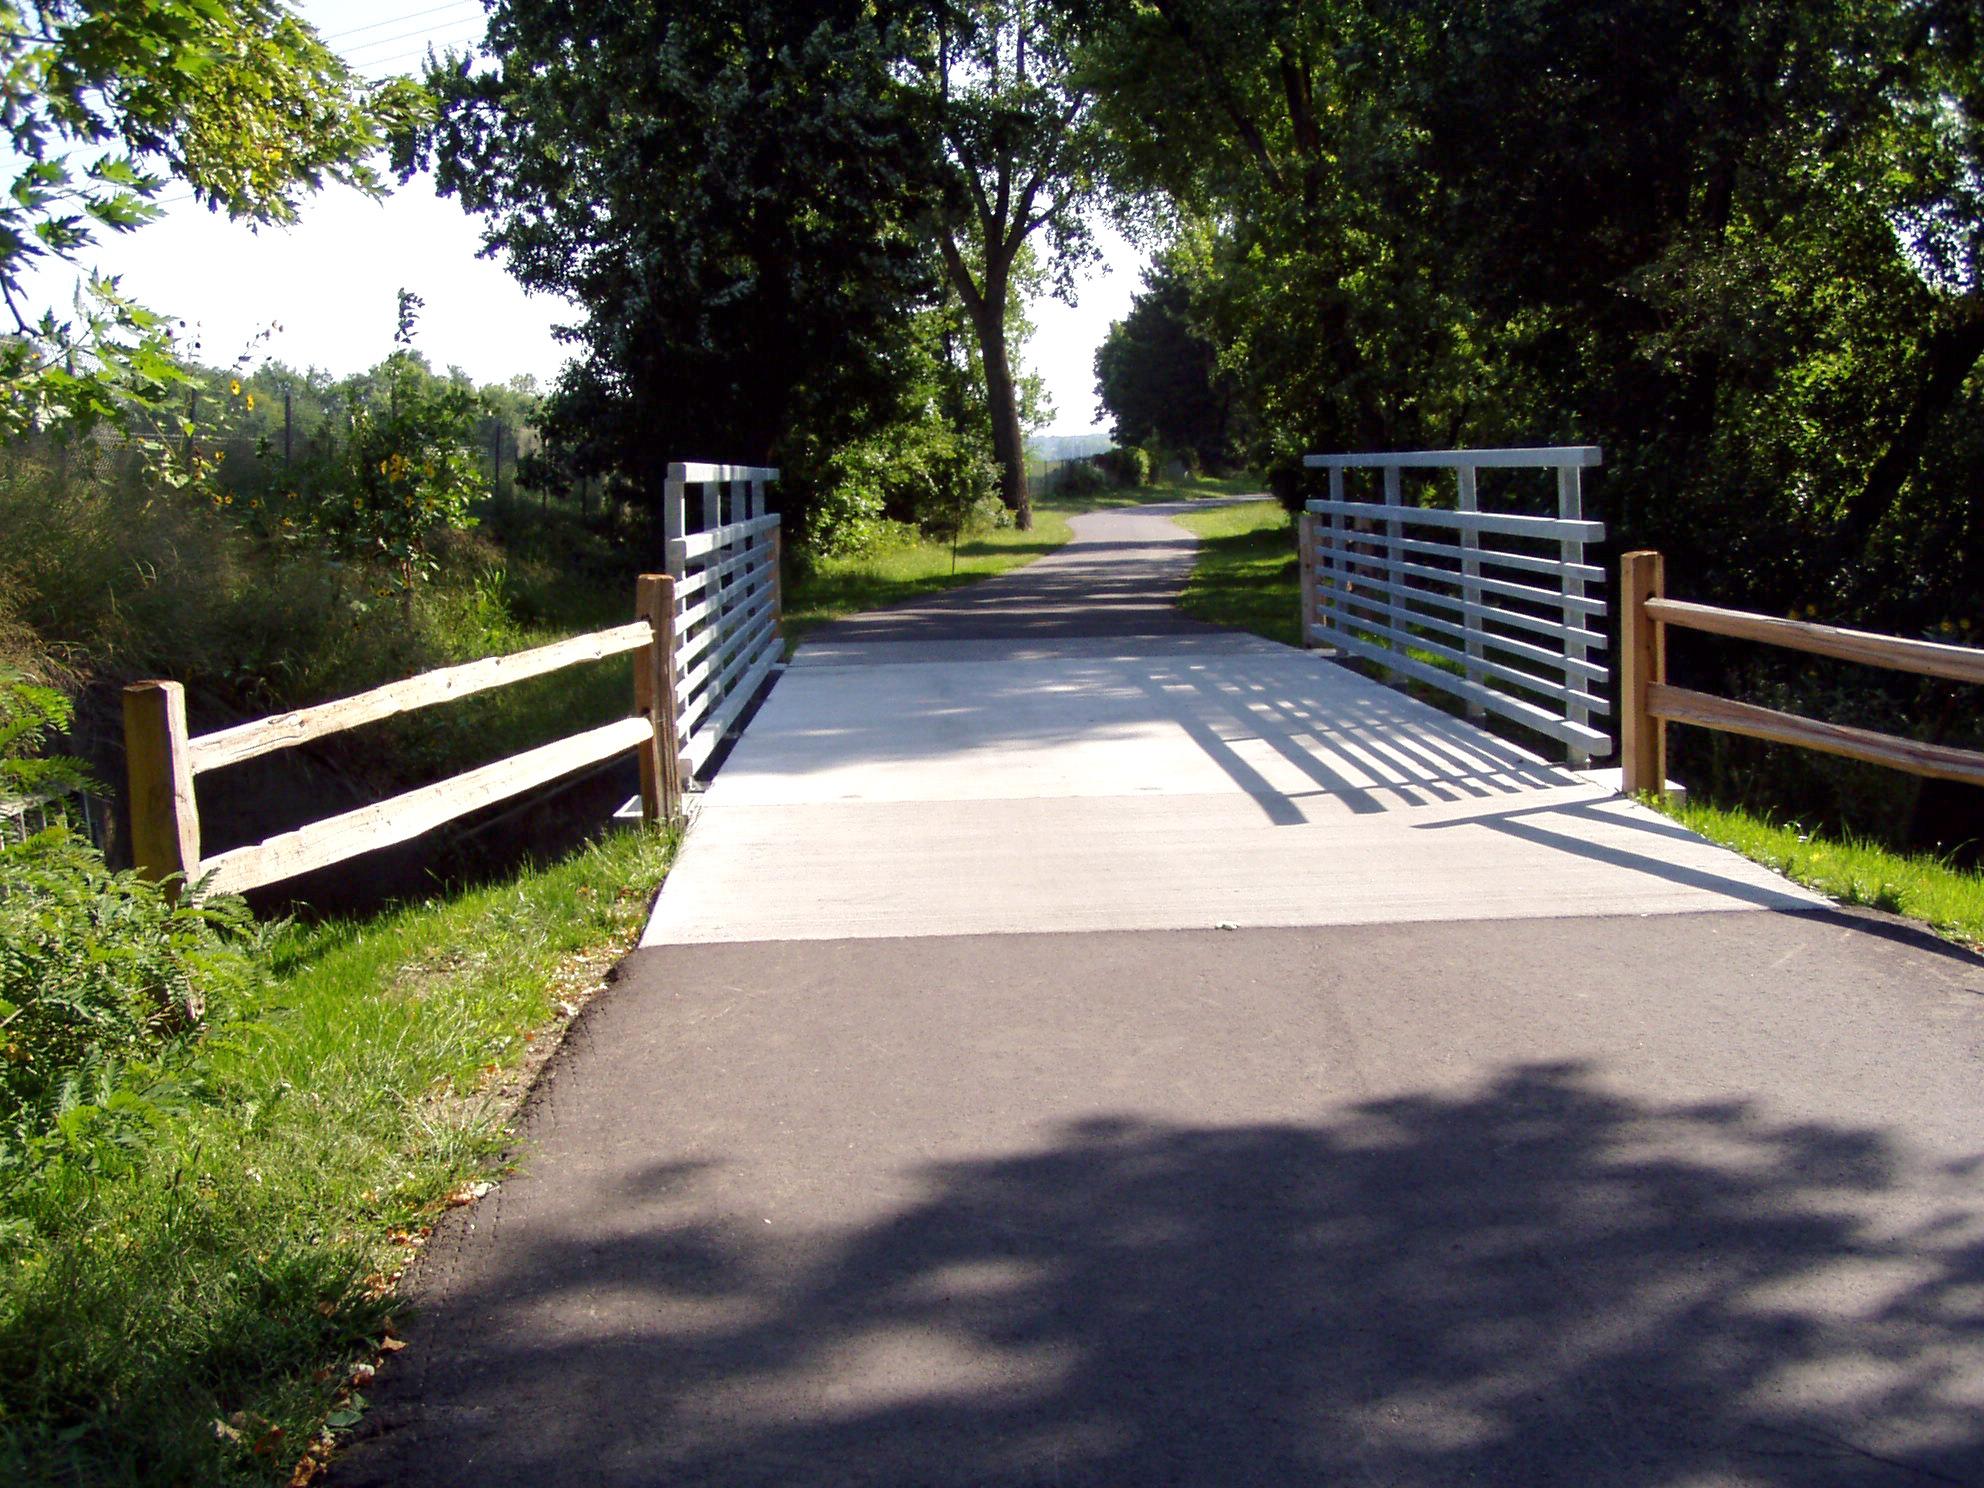 Spencer Park Bike Trails - Bridge